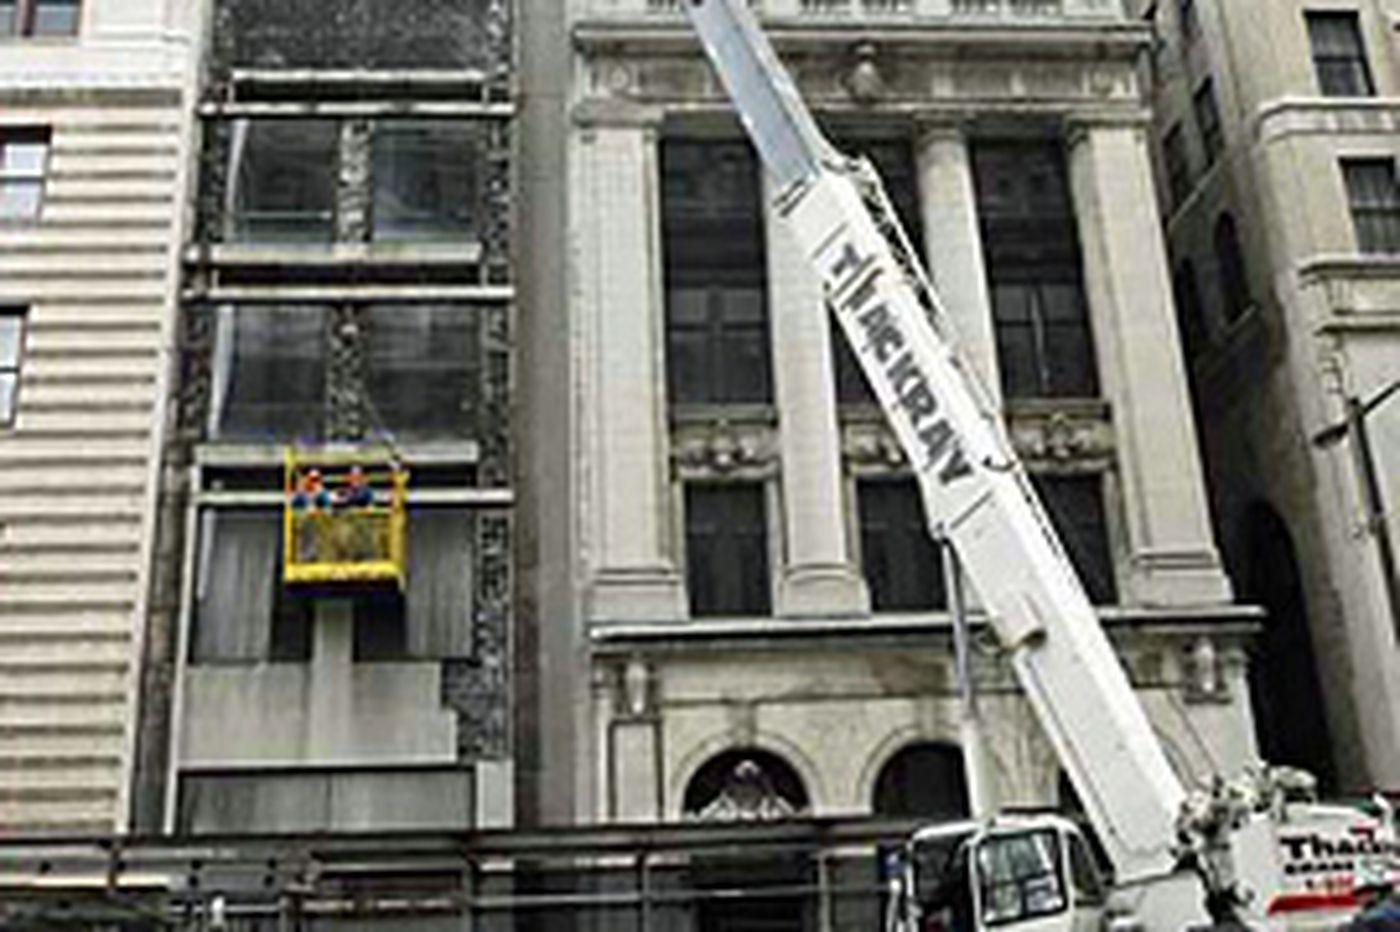 Judge: Pa. may defy deal, raze buildings